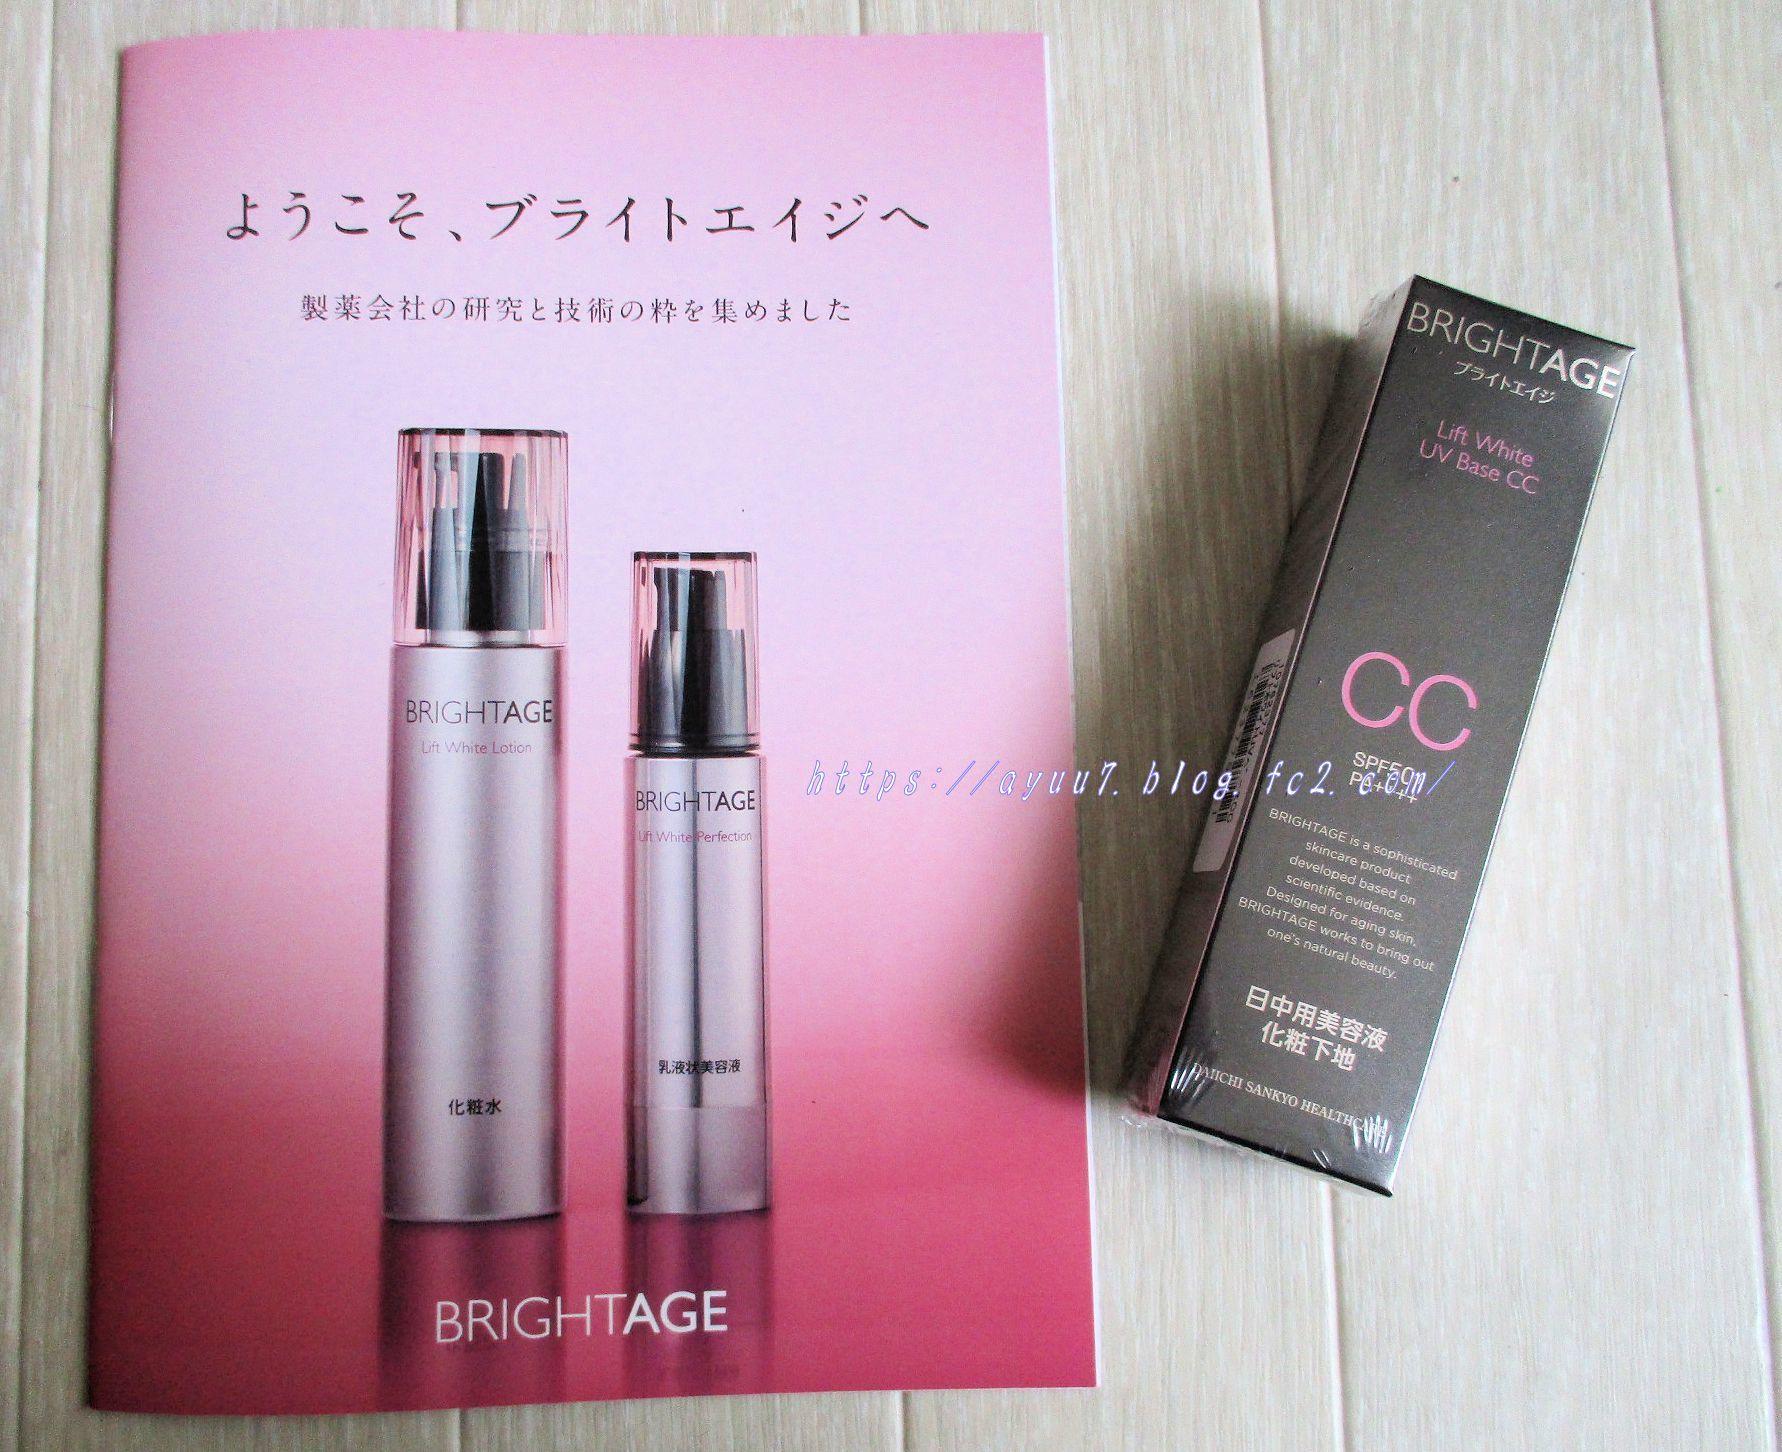 brightagecc.jpg